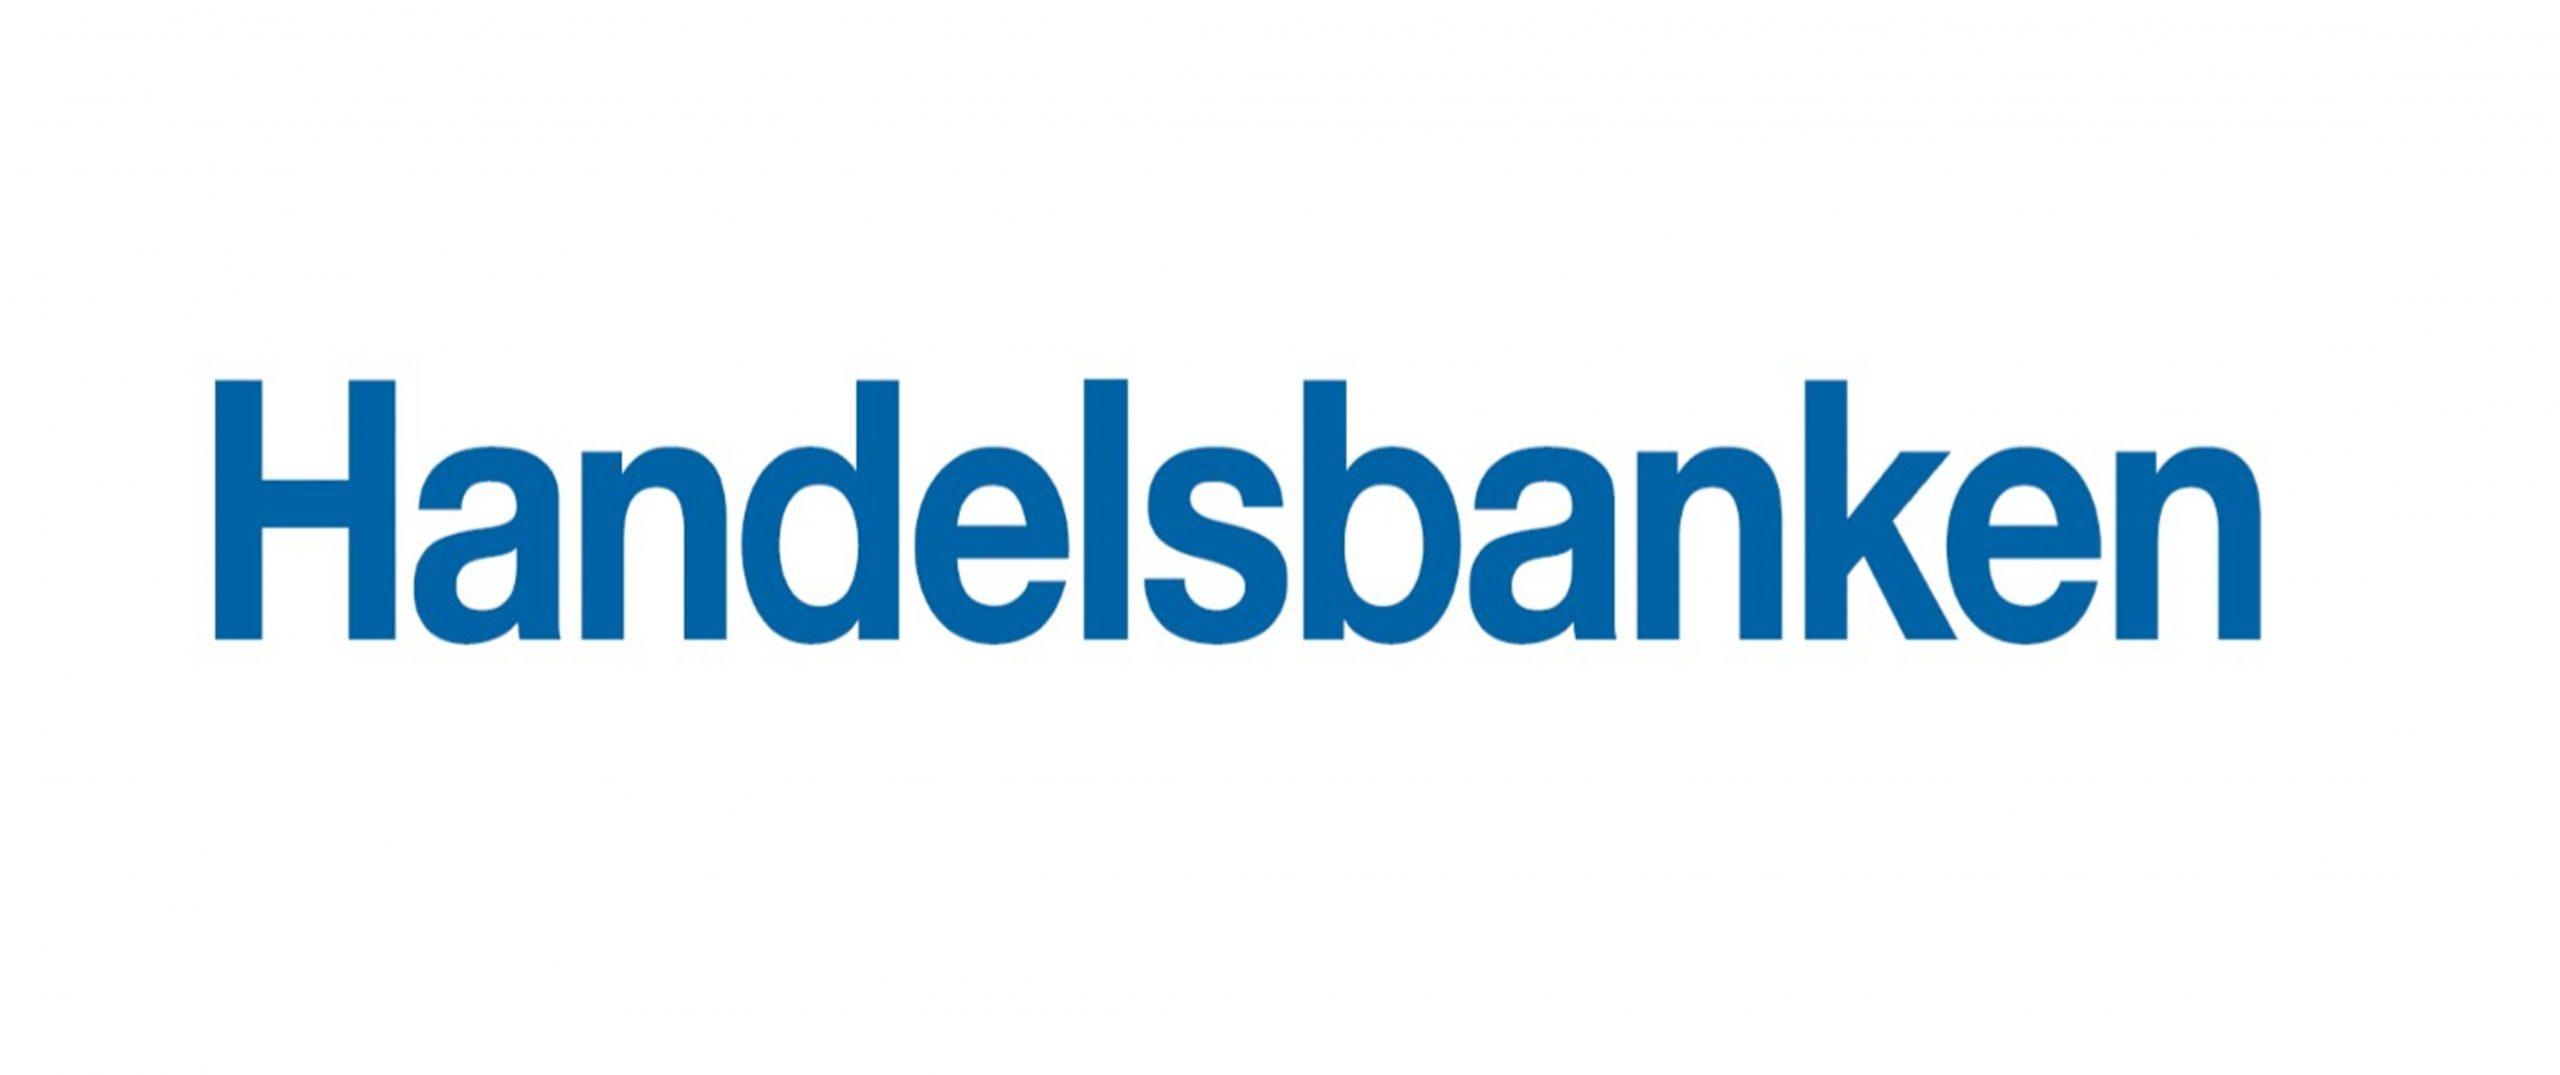 Handelsbanken Östersund